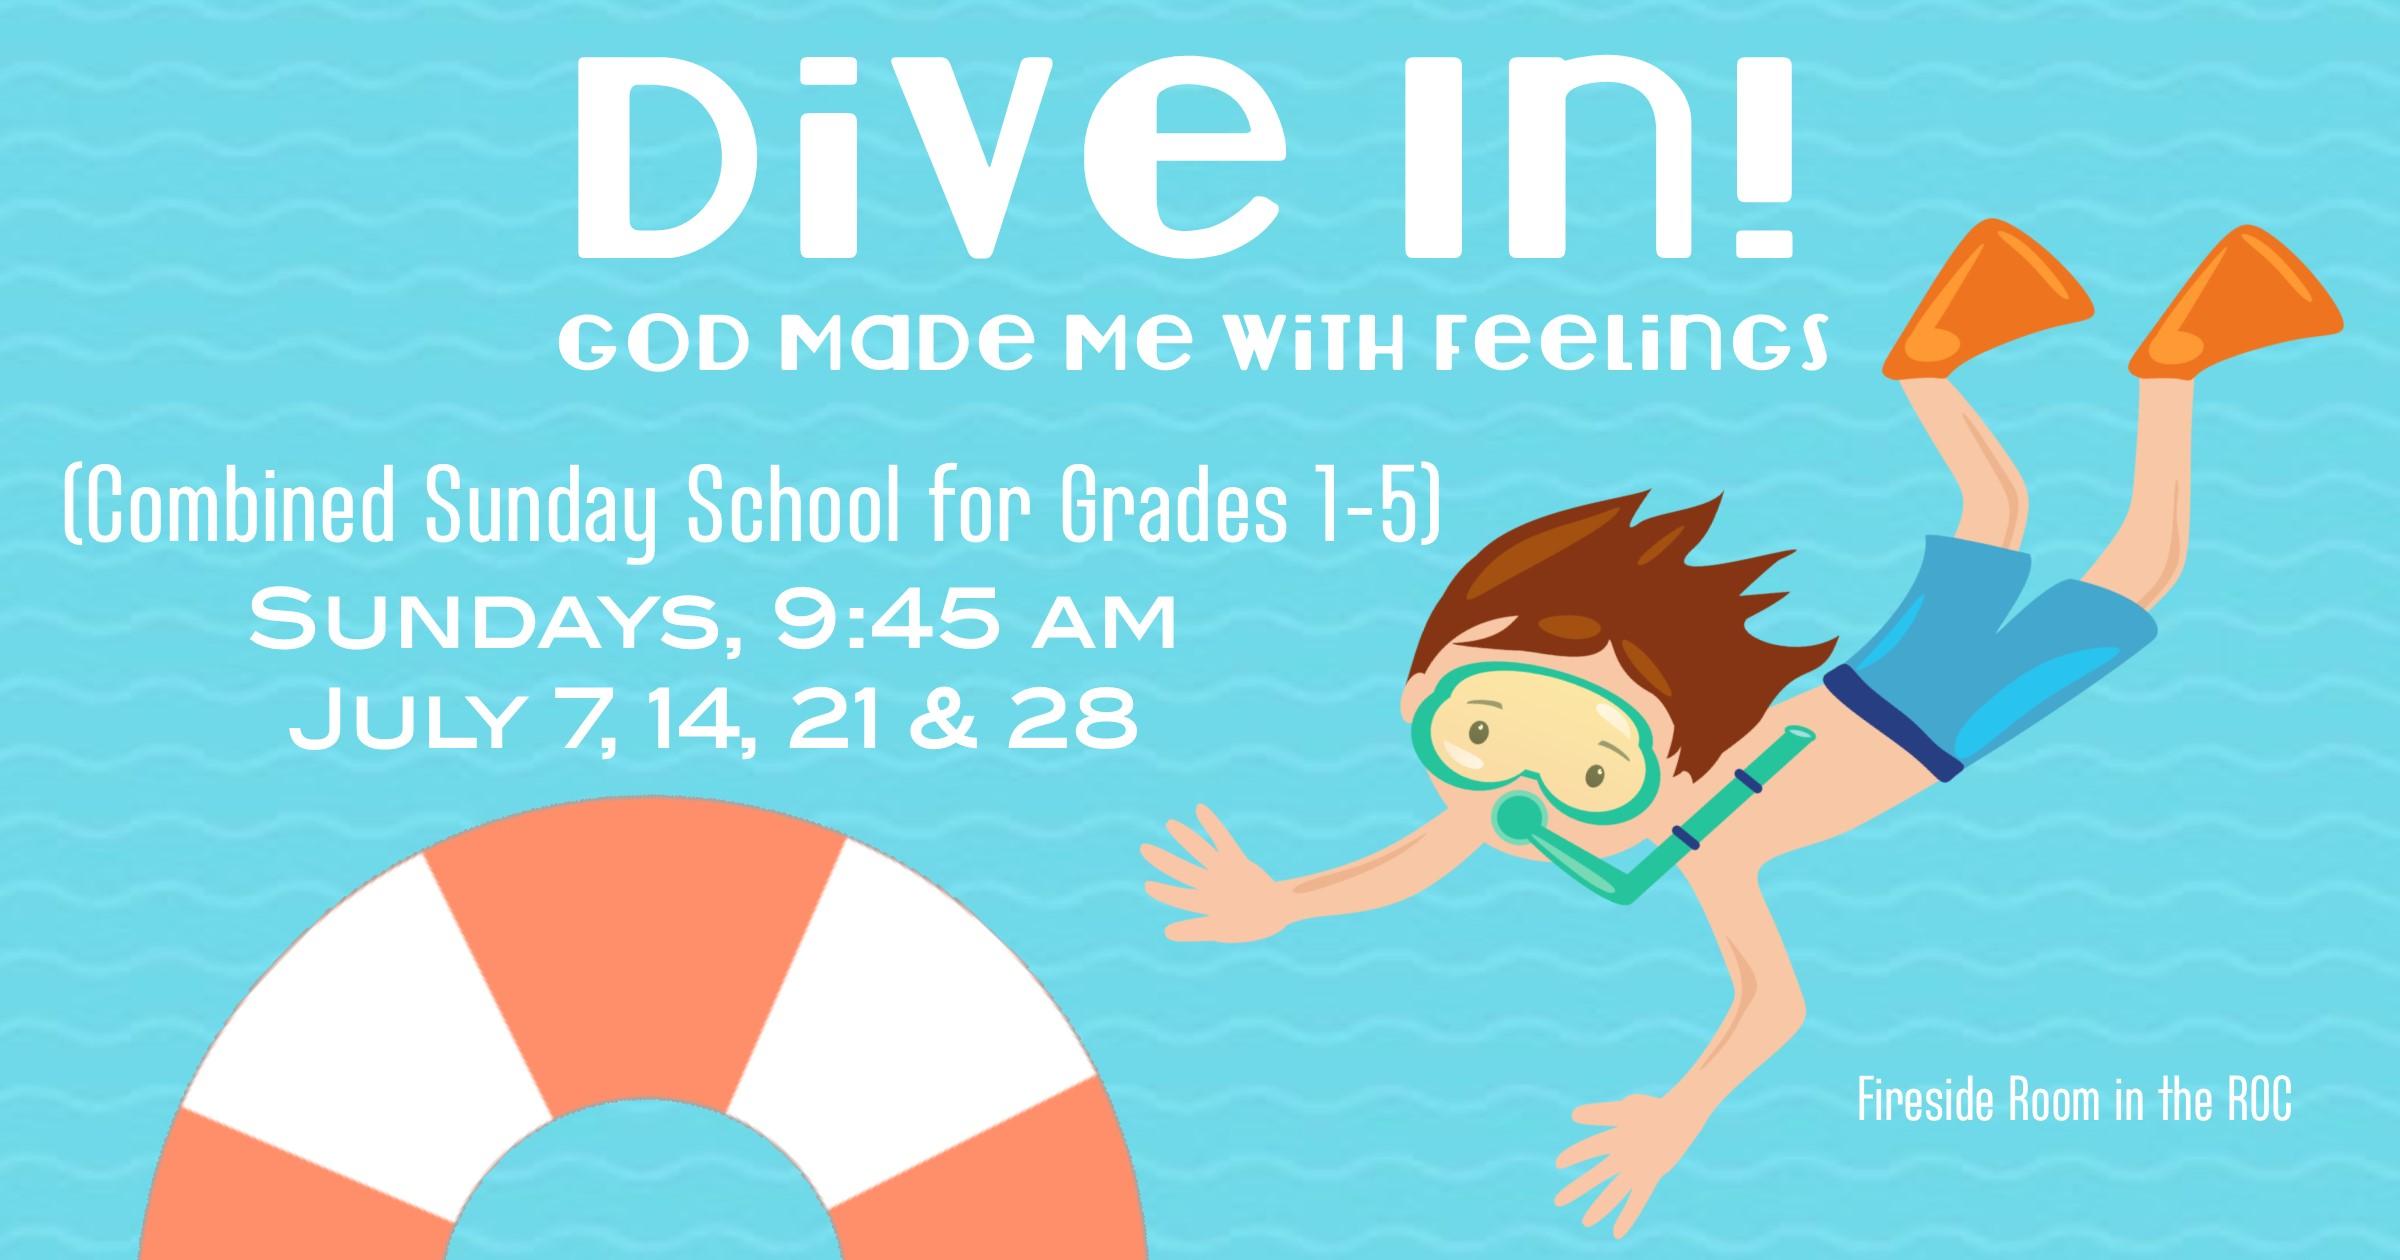 Dive In fb image.jpg